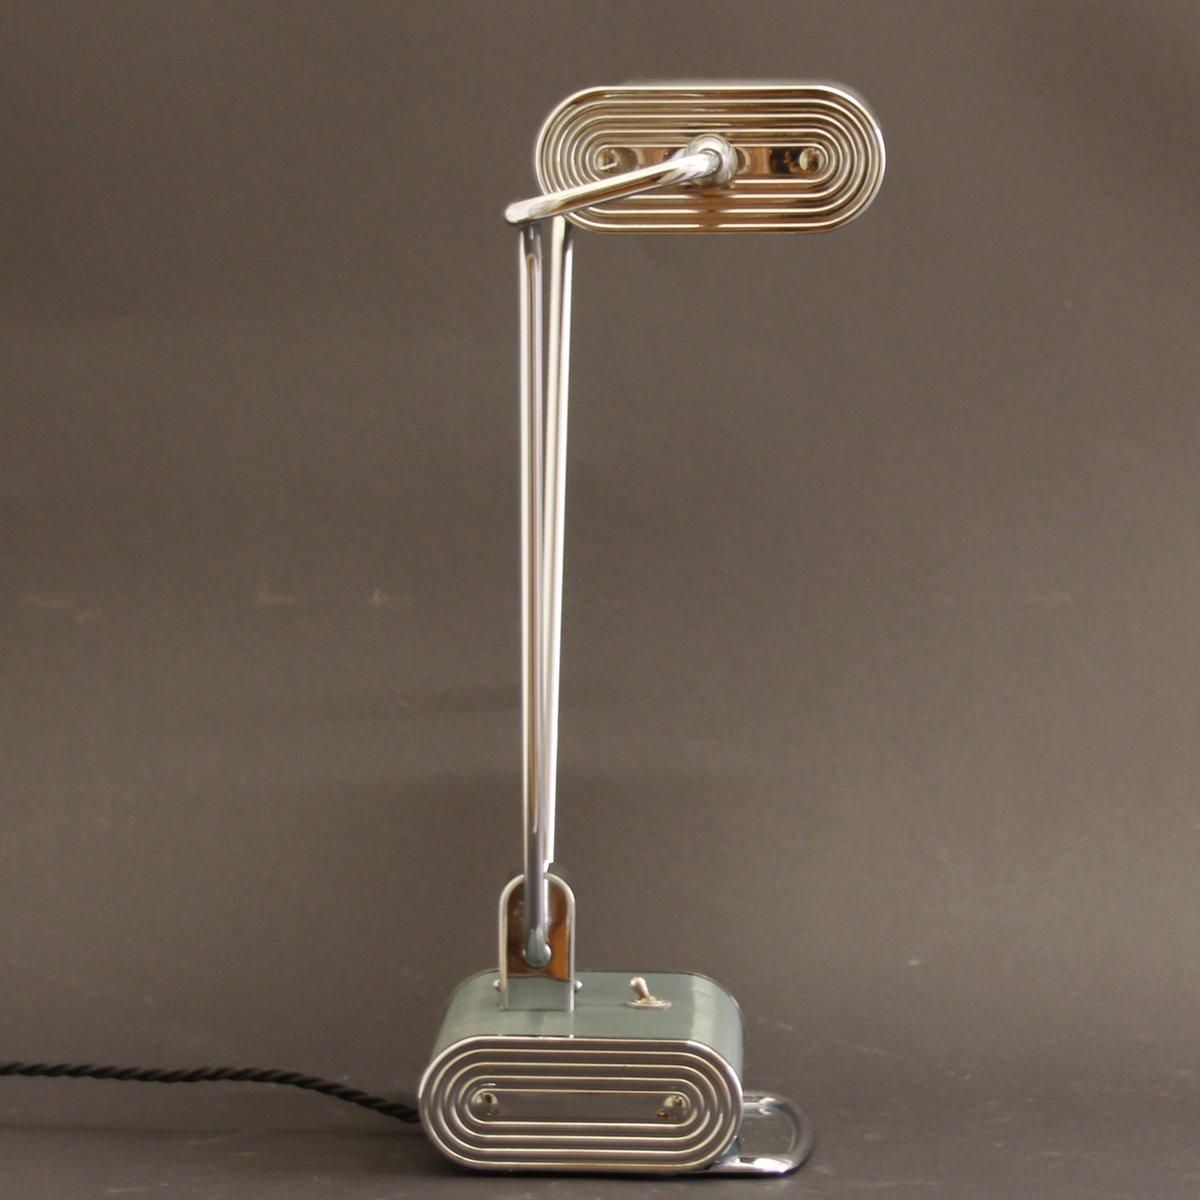 Green Chrome Art Deco Desk Lamp By Eileen Gray For Jumo